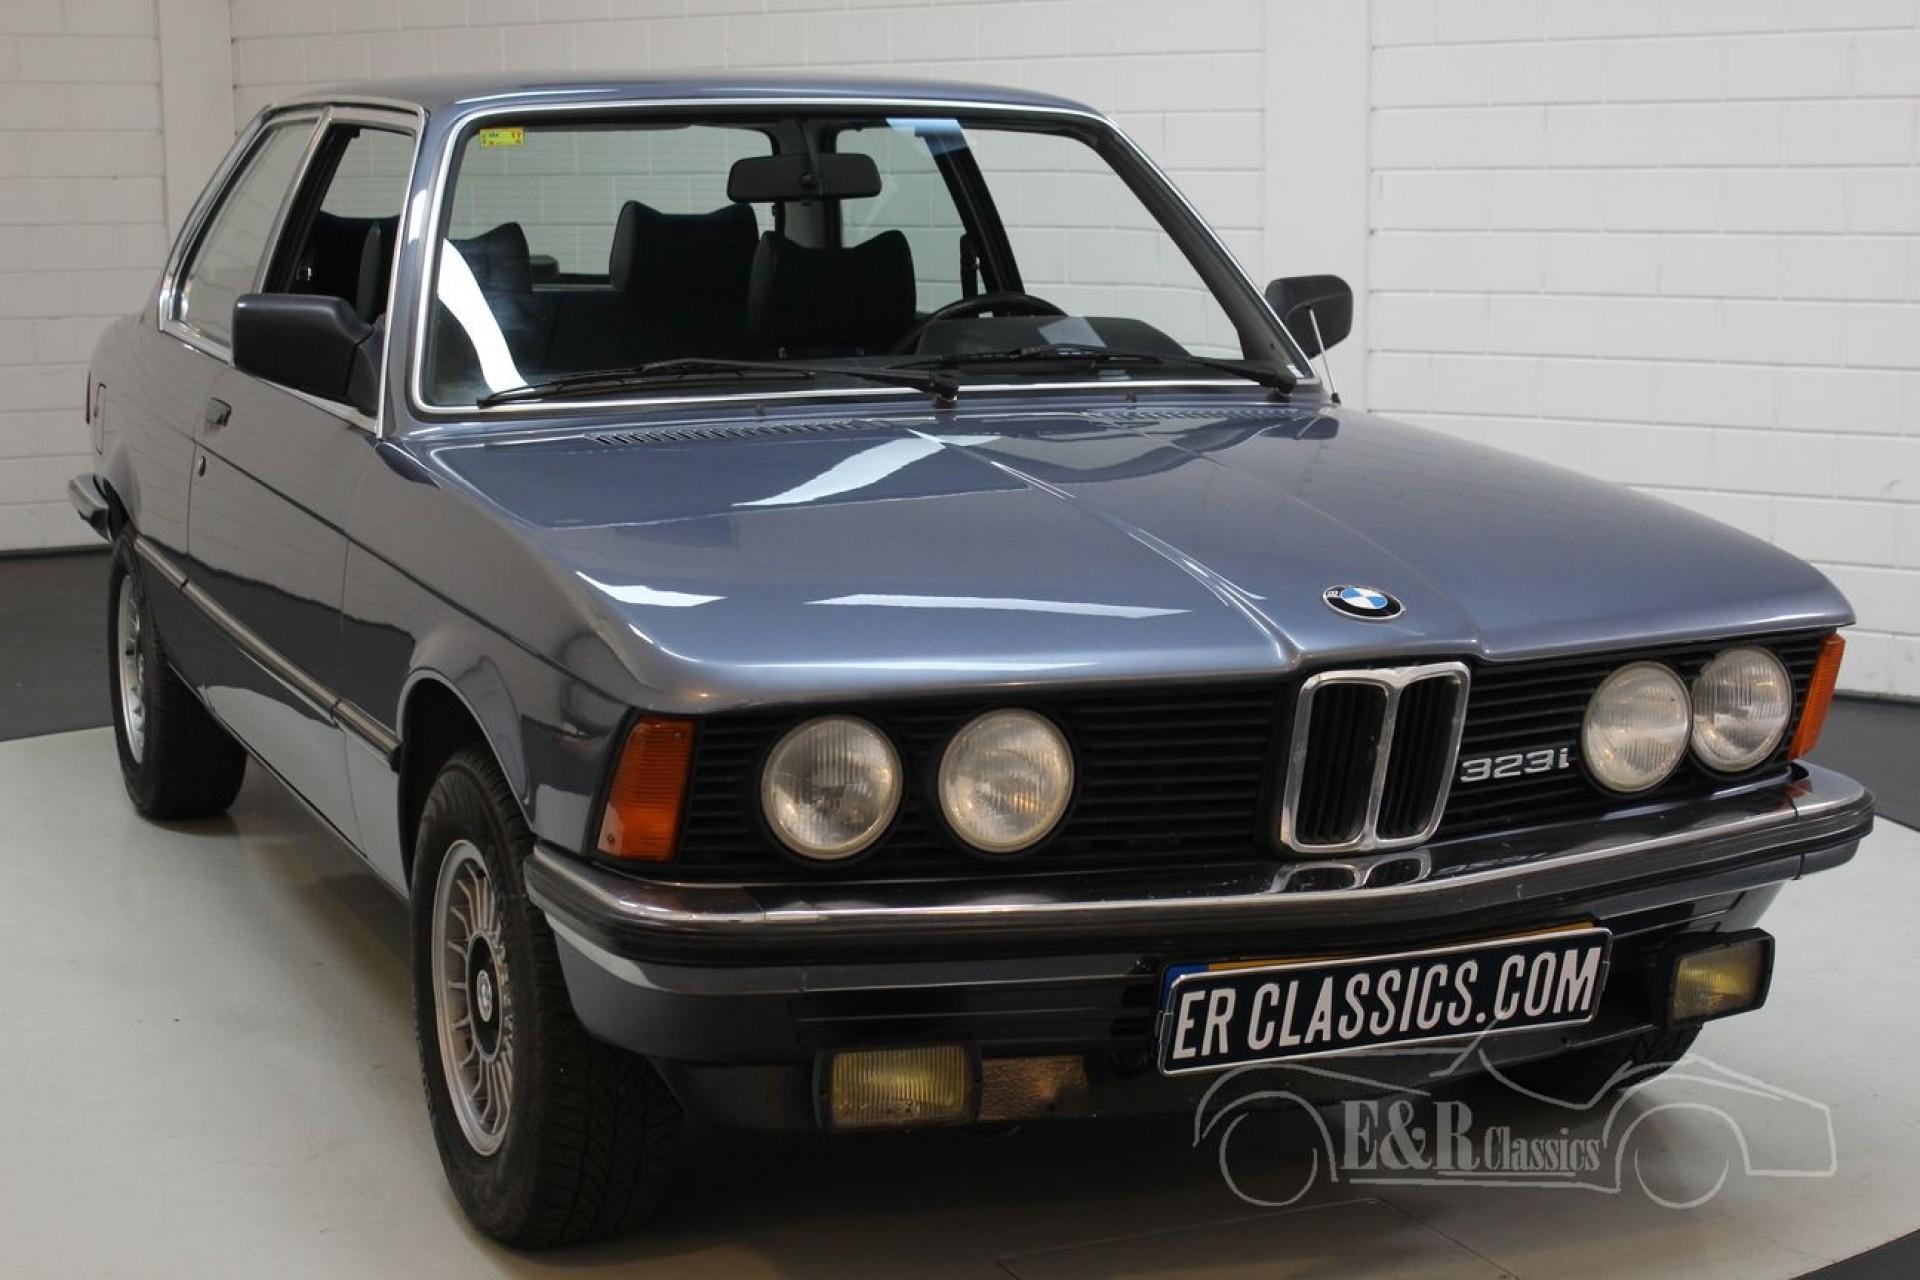 Bmw E21 323i 1980 For Sale At Erclassics